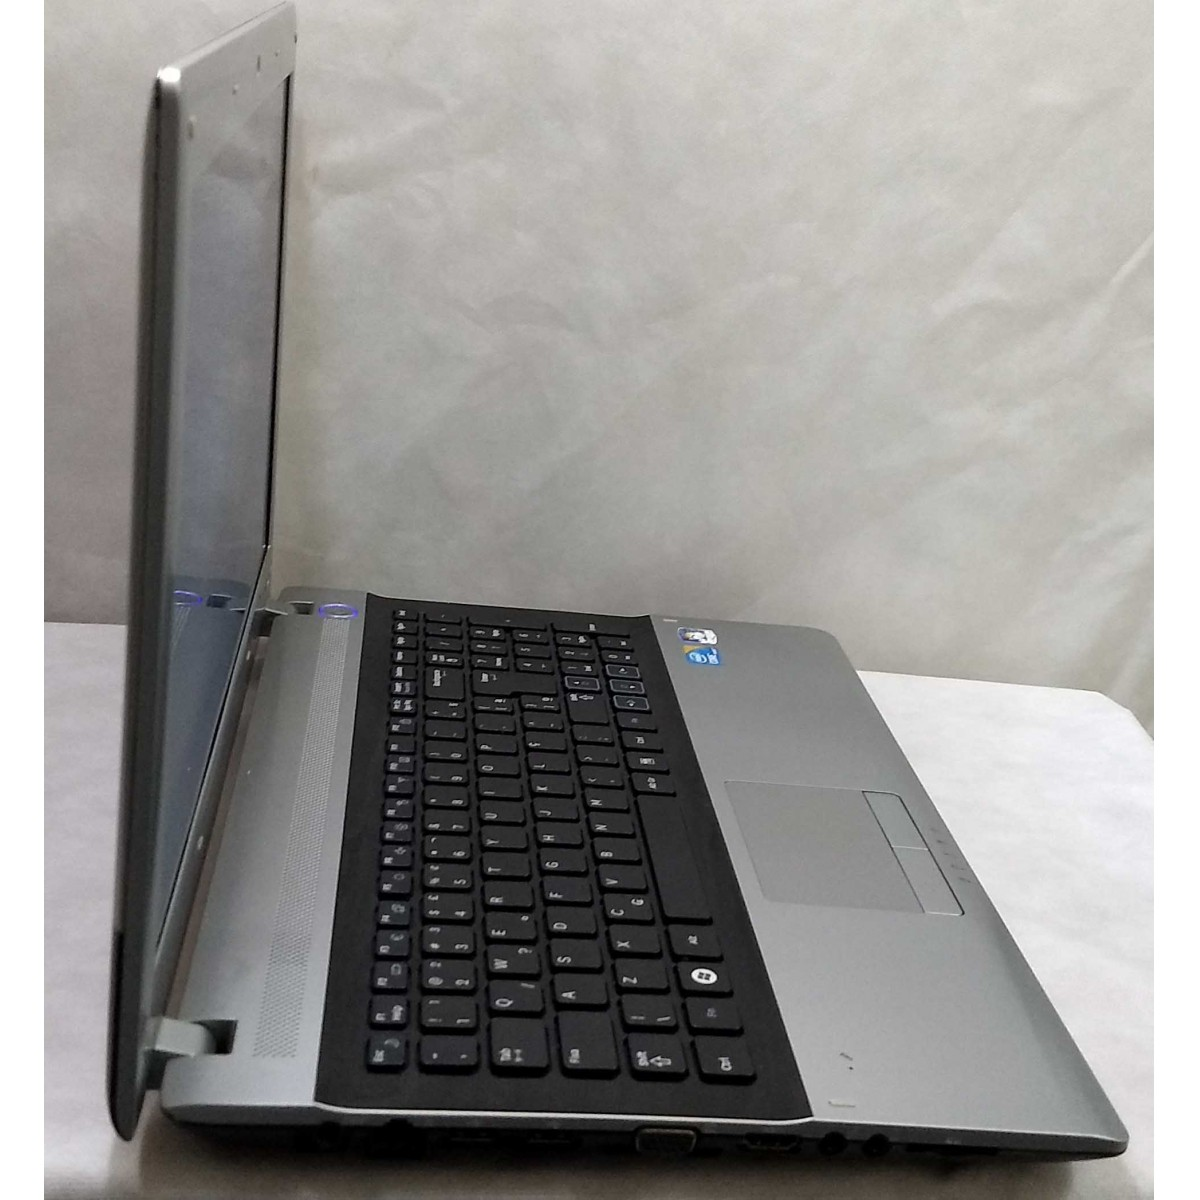 Notebook Samsung NP-RV511-AD1BR Core i3 2.6GHz 4GB HD-320GB + Alphanumérico